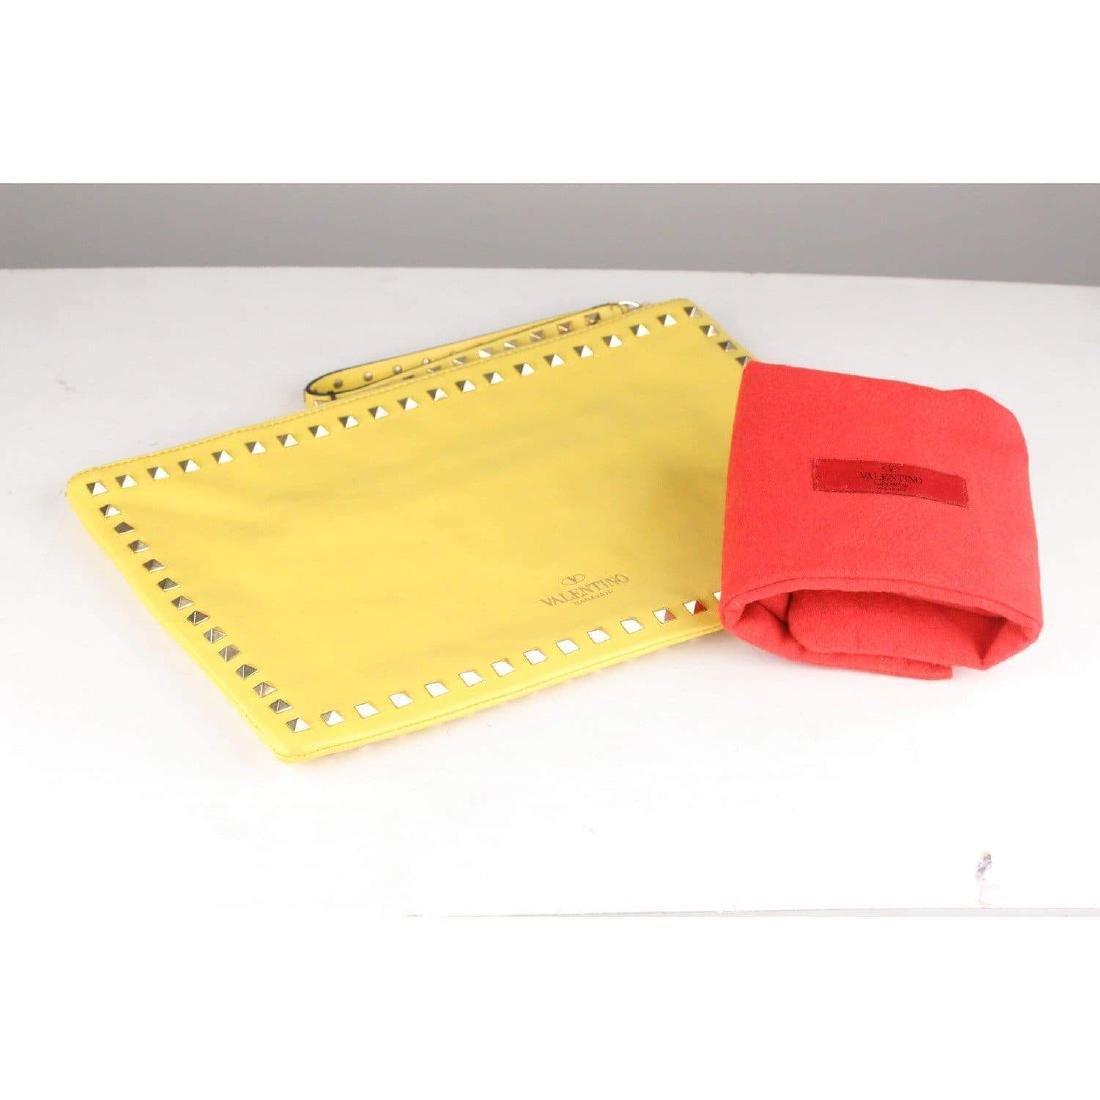 Valentino Rockstud Large Clutch Wrist Bag - 3